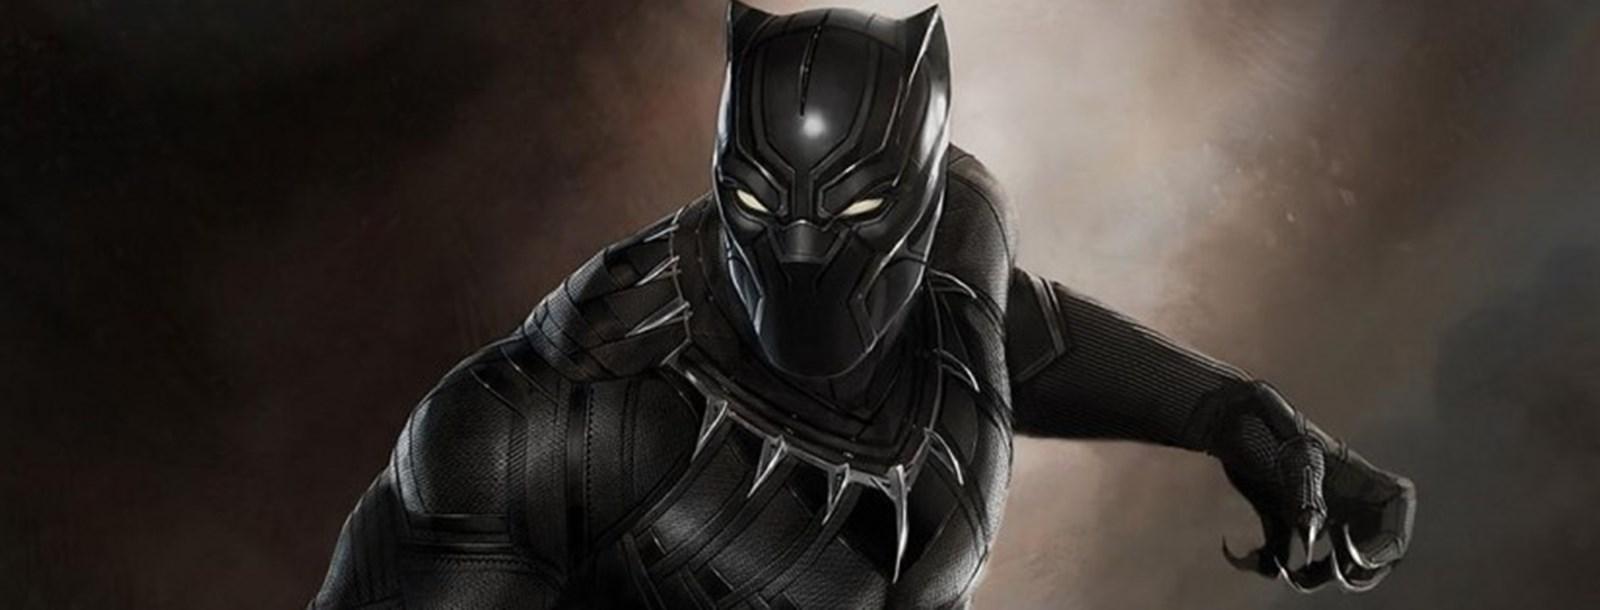 Black Panther - Hvalospevi, čemu???